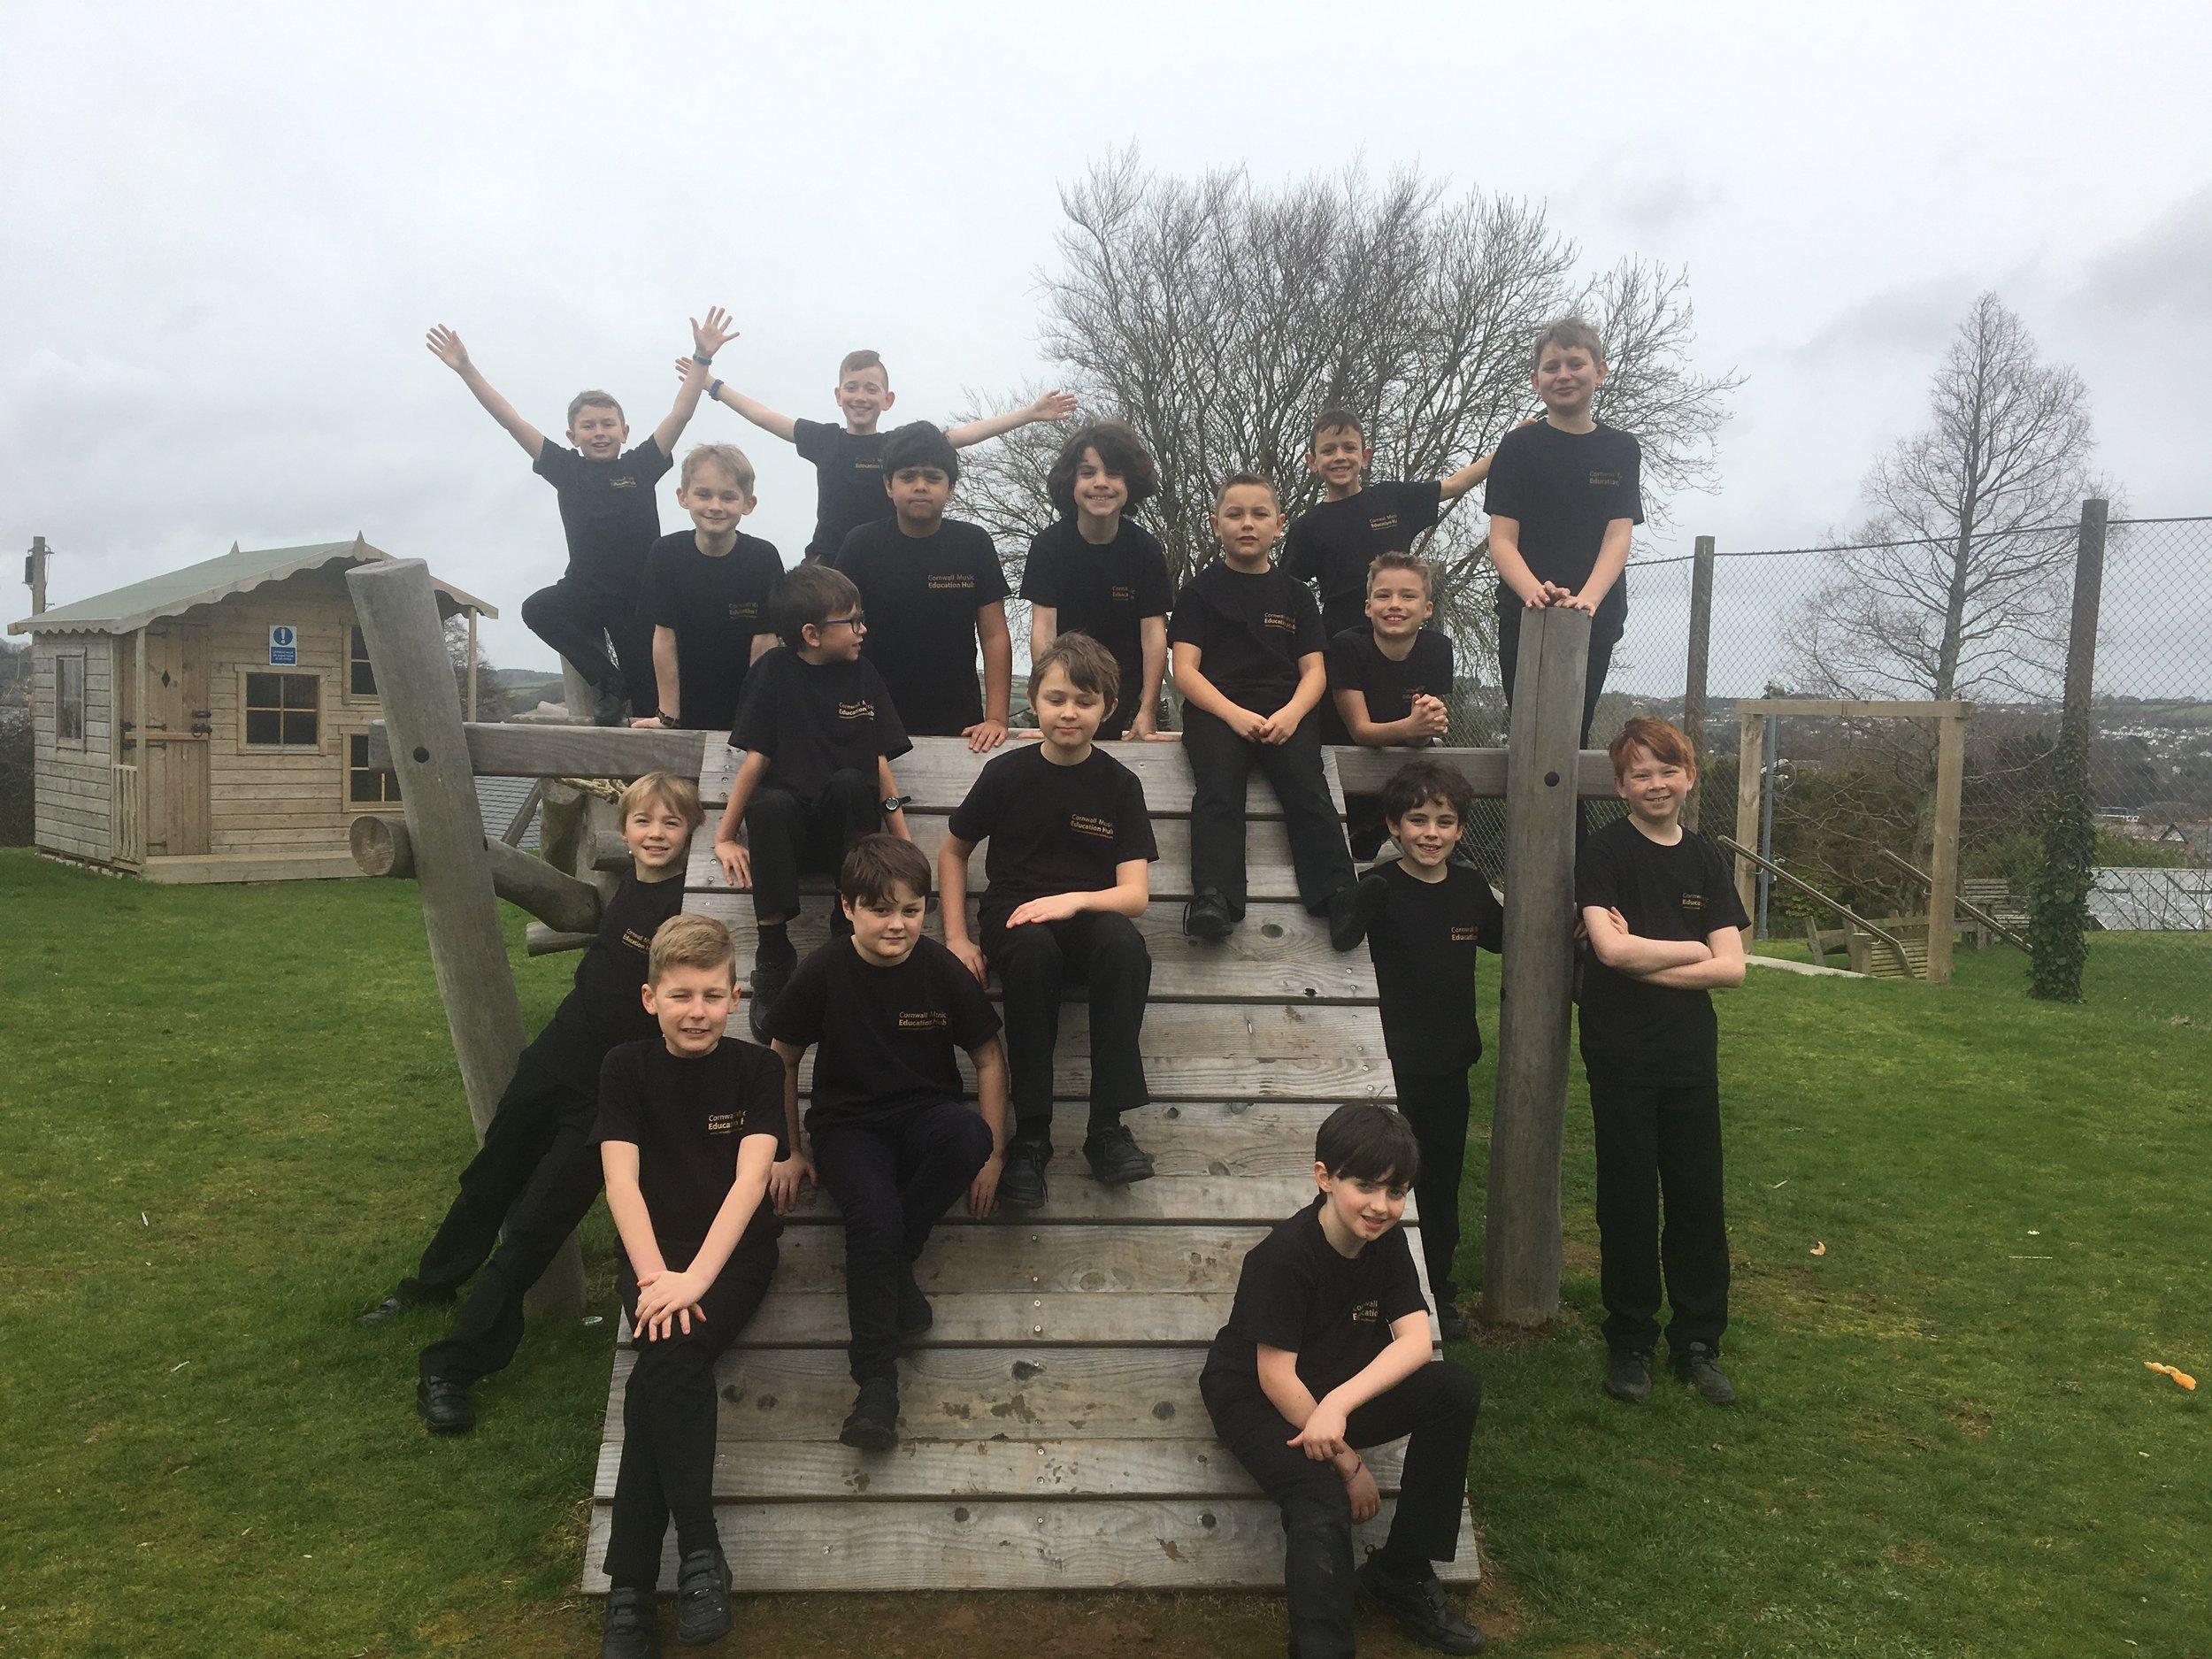 Cornwall Boys Choir 2019.JPG